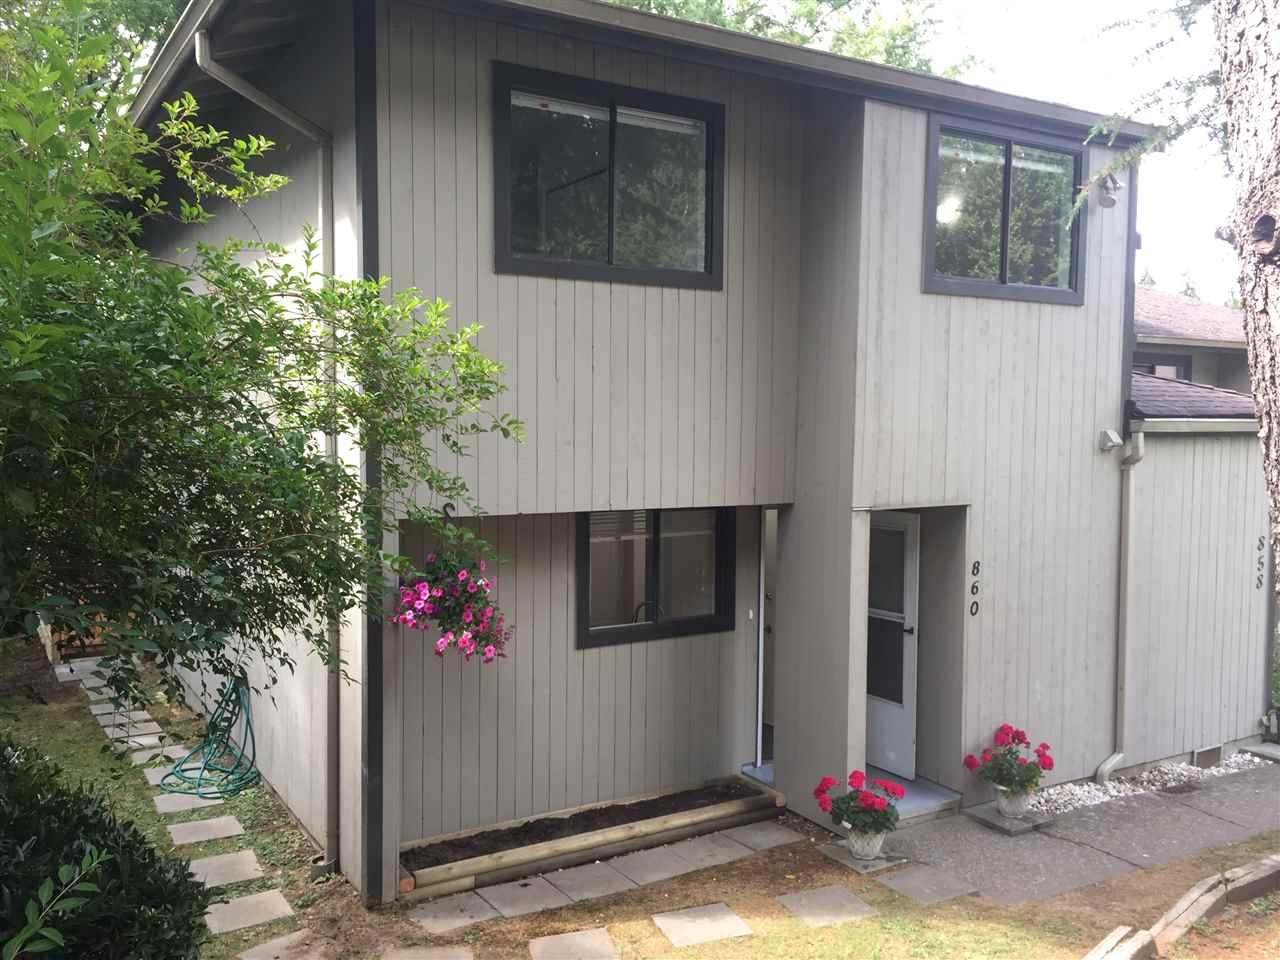 Townhouse at 860 BLACKSTOCK ROAD, Port Moody, British Columbia. Image 1